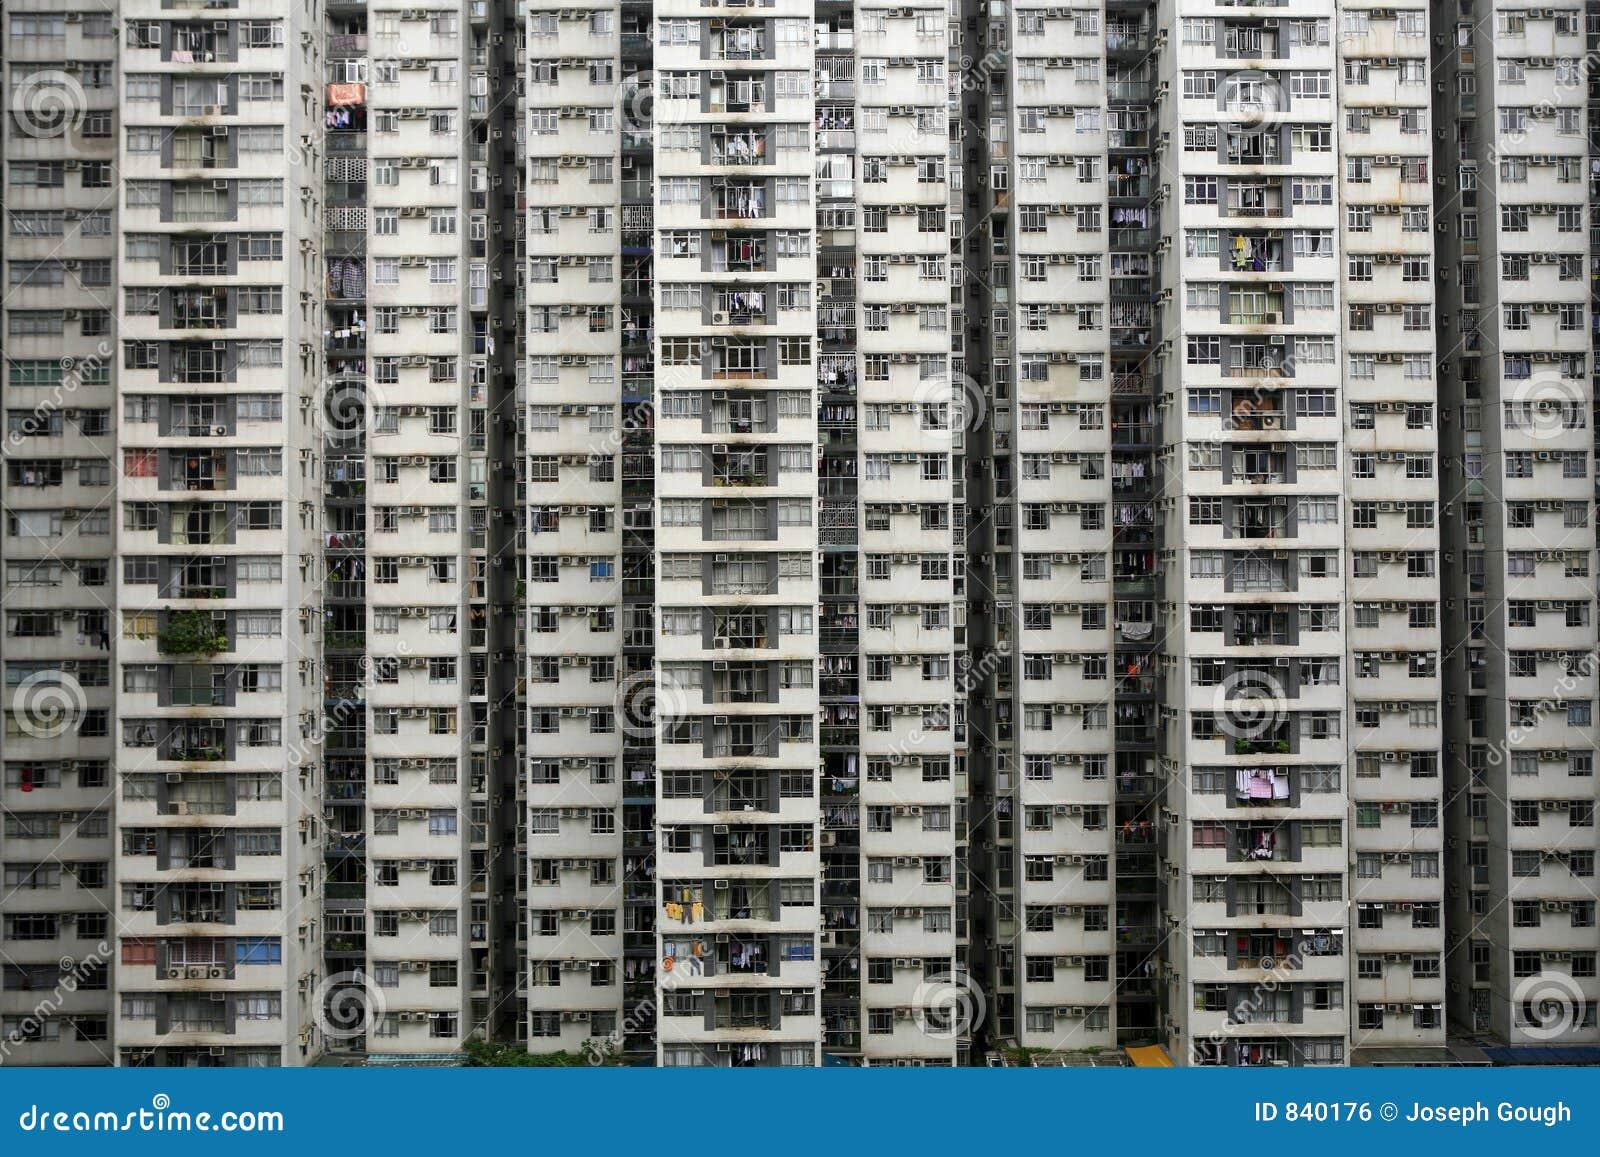 Carcaça High-Density